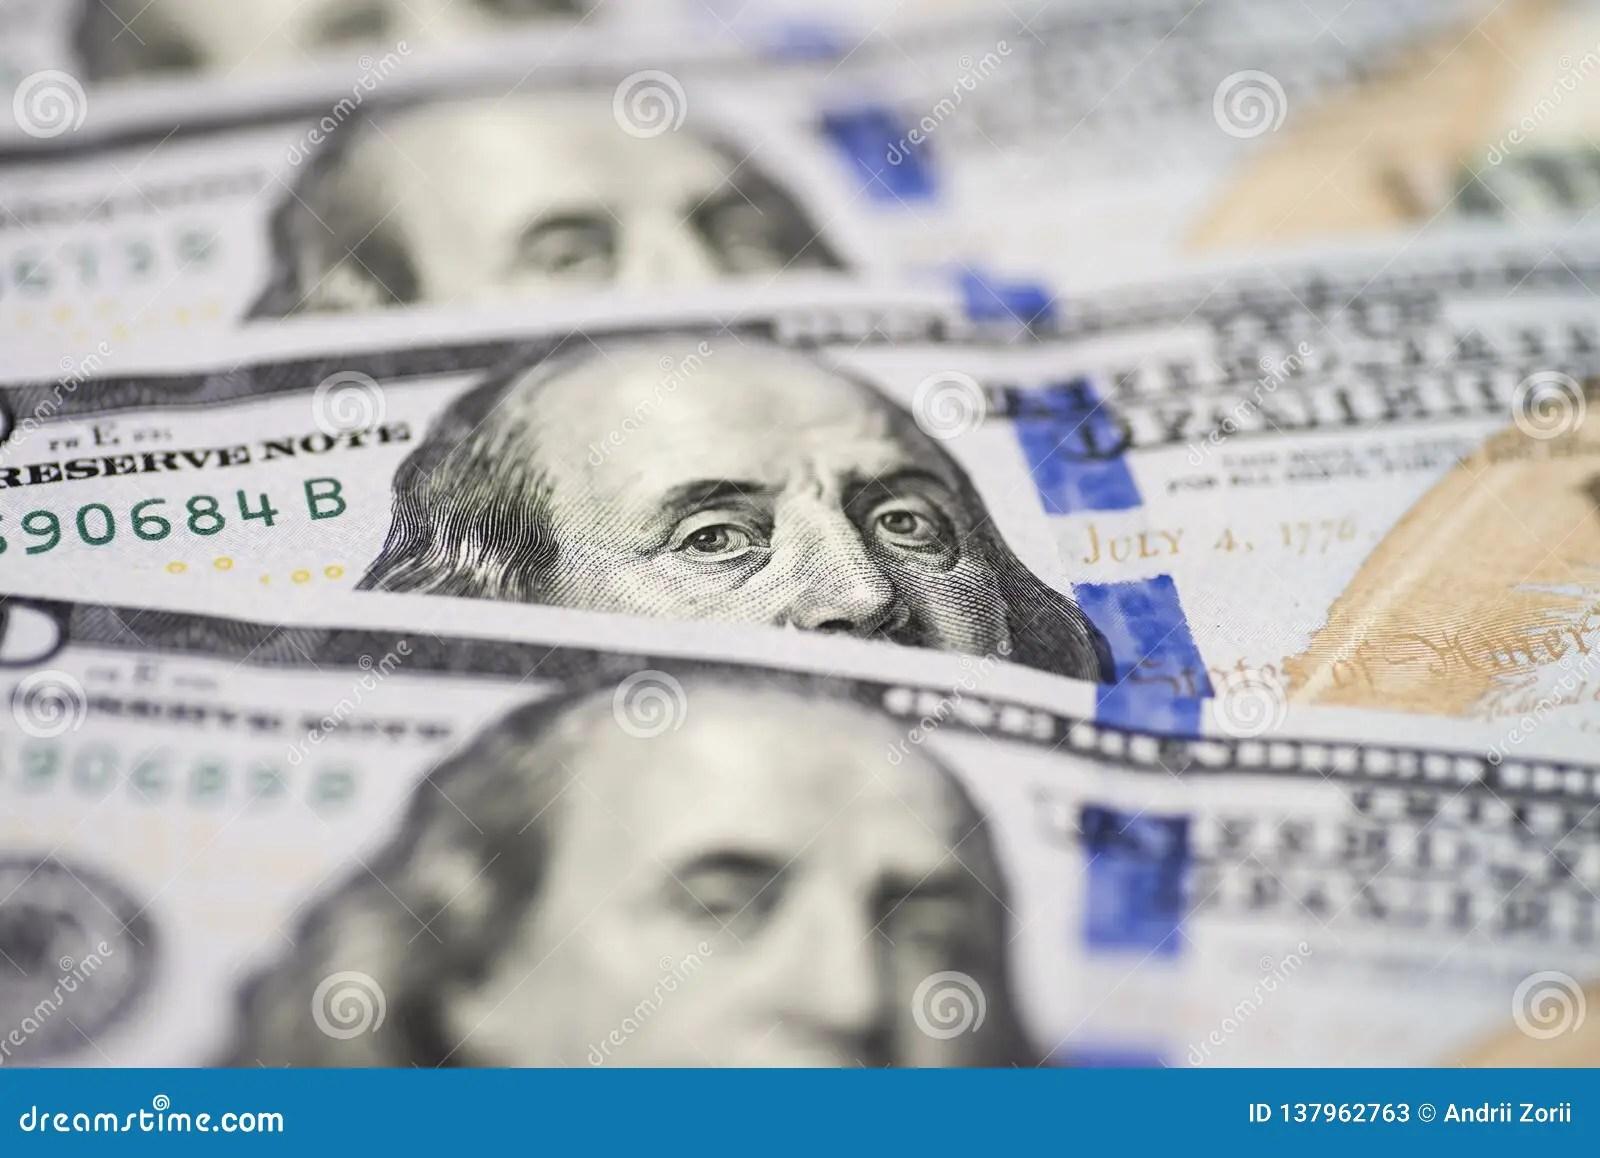 Dolar Usa Close Up Benjamin Franklin S Eyes From A